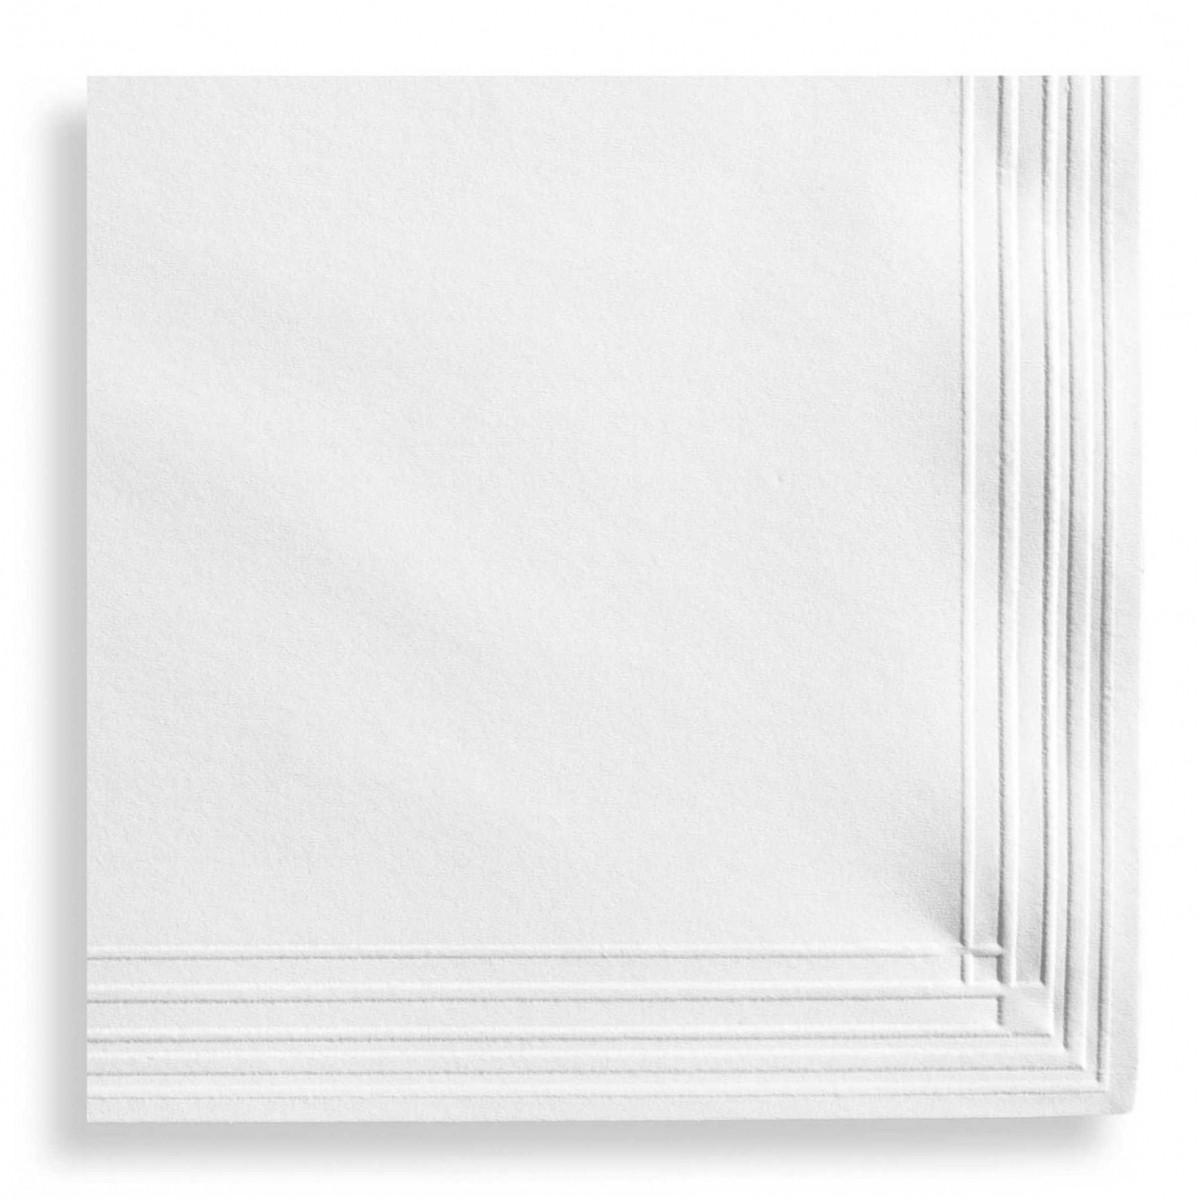 Guardanapo de papel KIT  - Persona Guardanapos & Cia